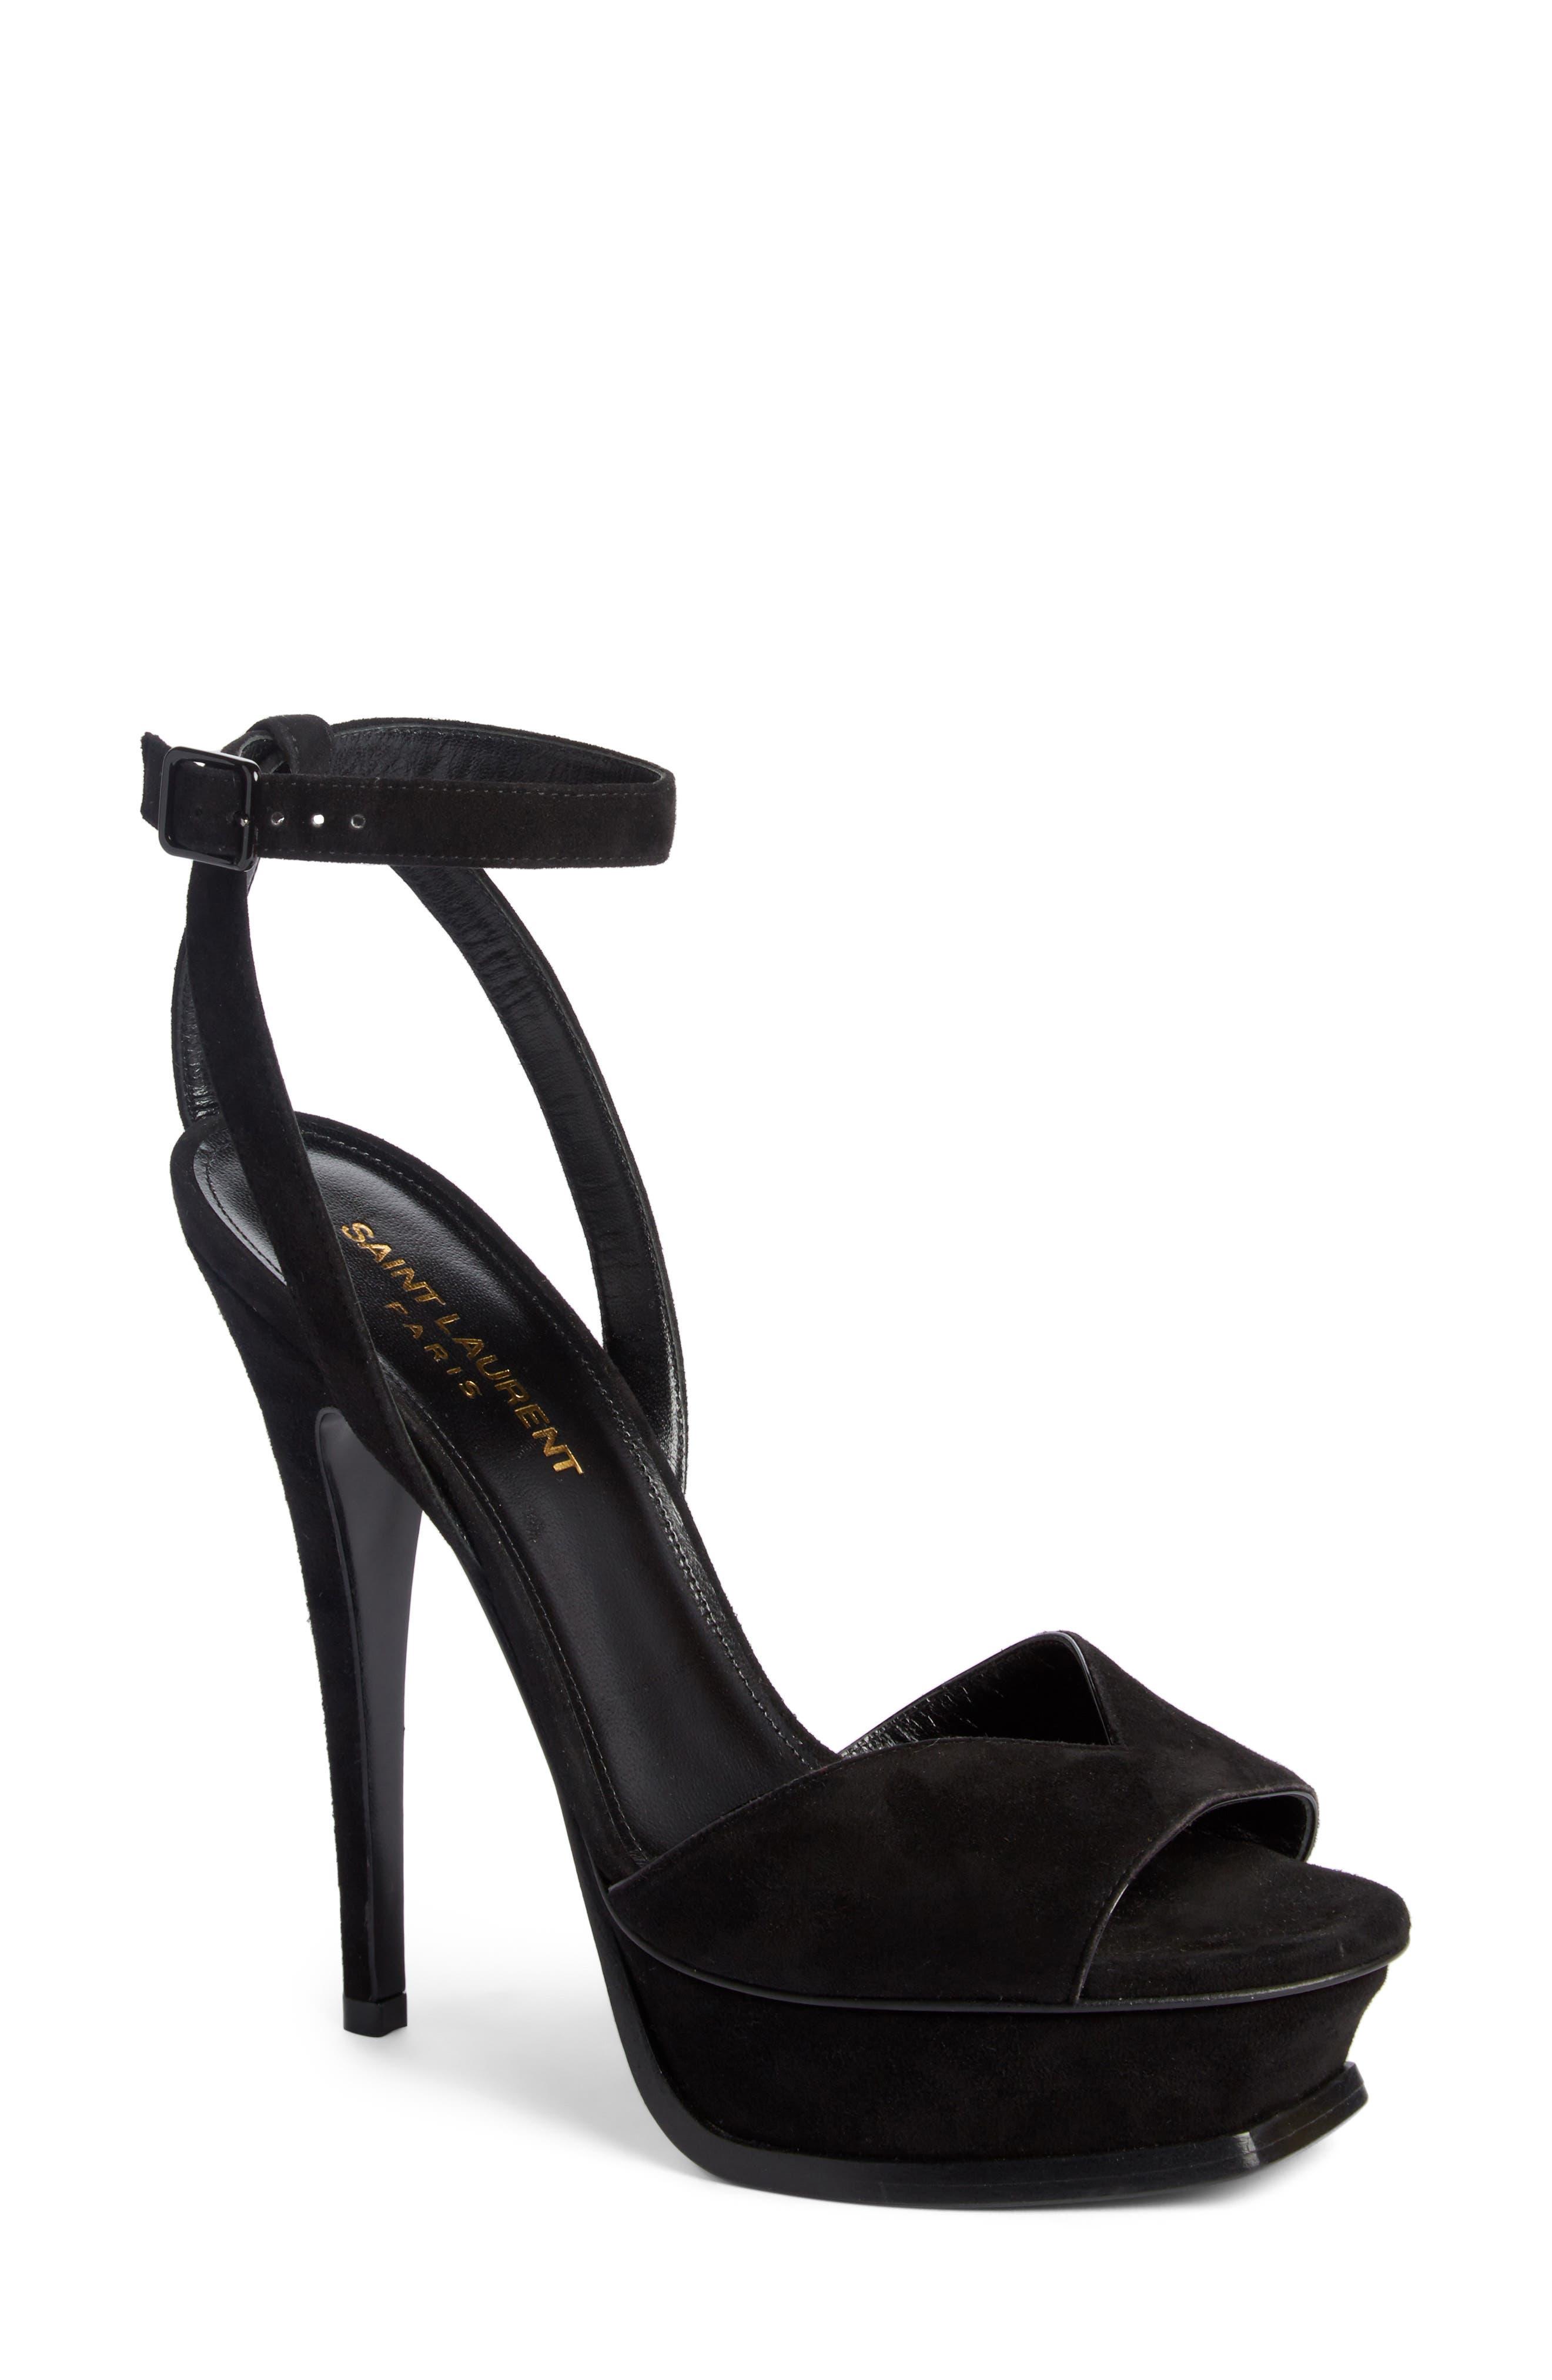 Main Image - Saint Laurent Tribute Platform Sandal (Women)